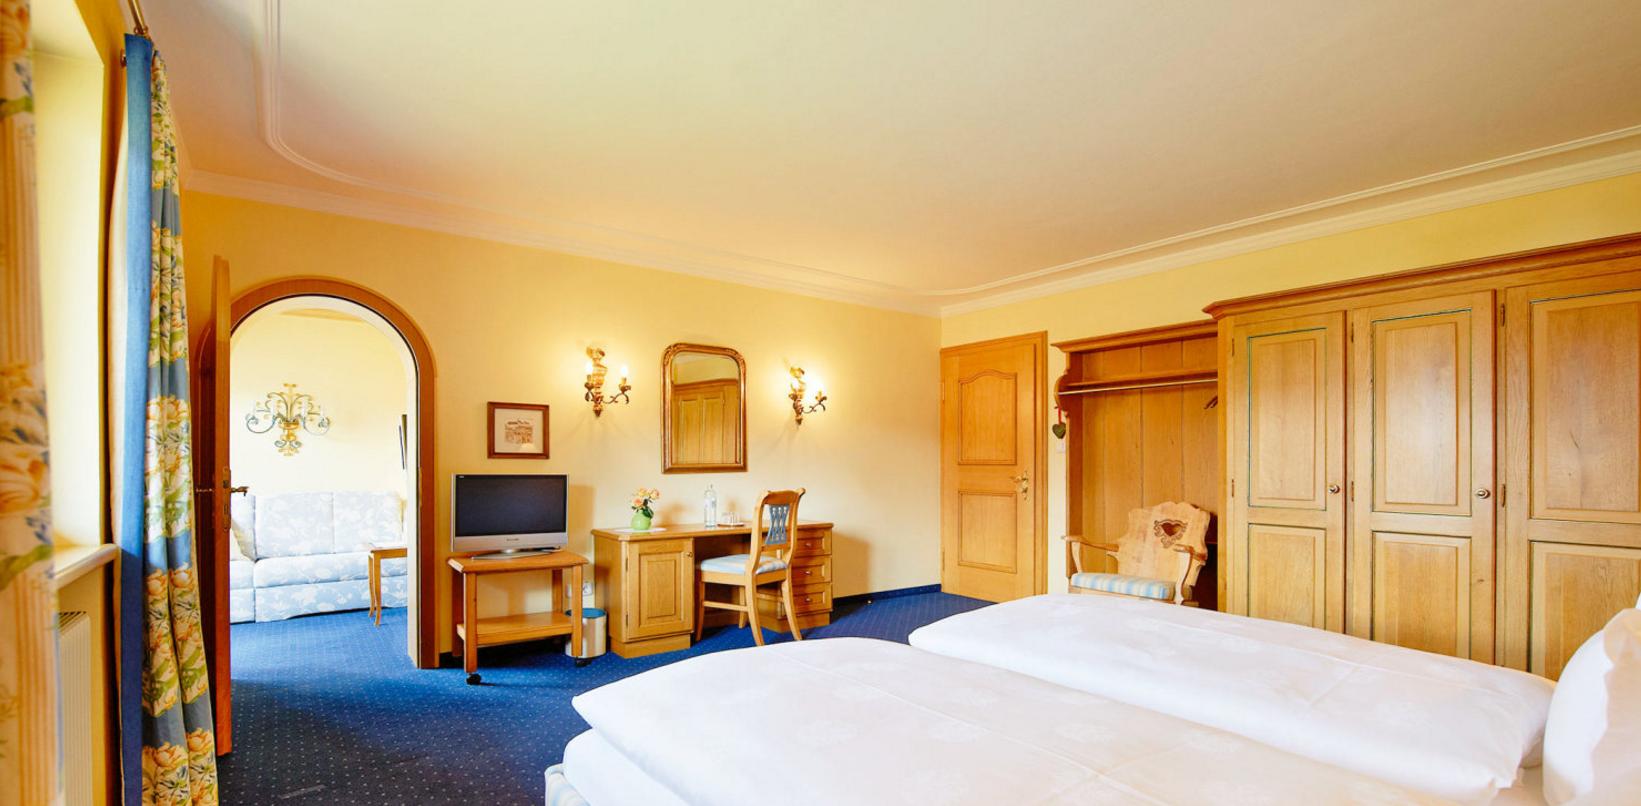 hotel alpenland in lech am arlberg hotels hotels restaurants lech sterreich tel 055832. Black Bedroom Furniture Sets. Home Design Ideas